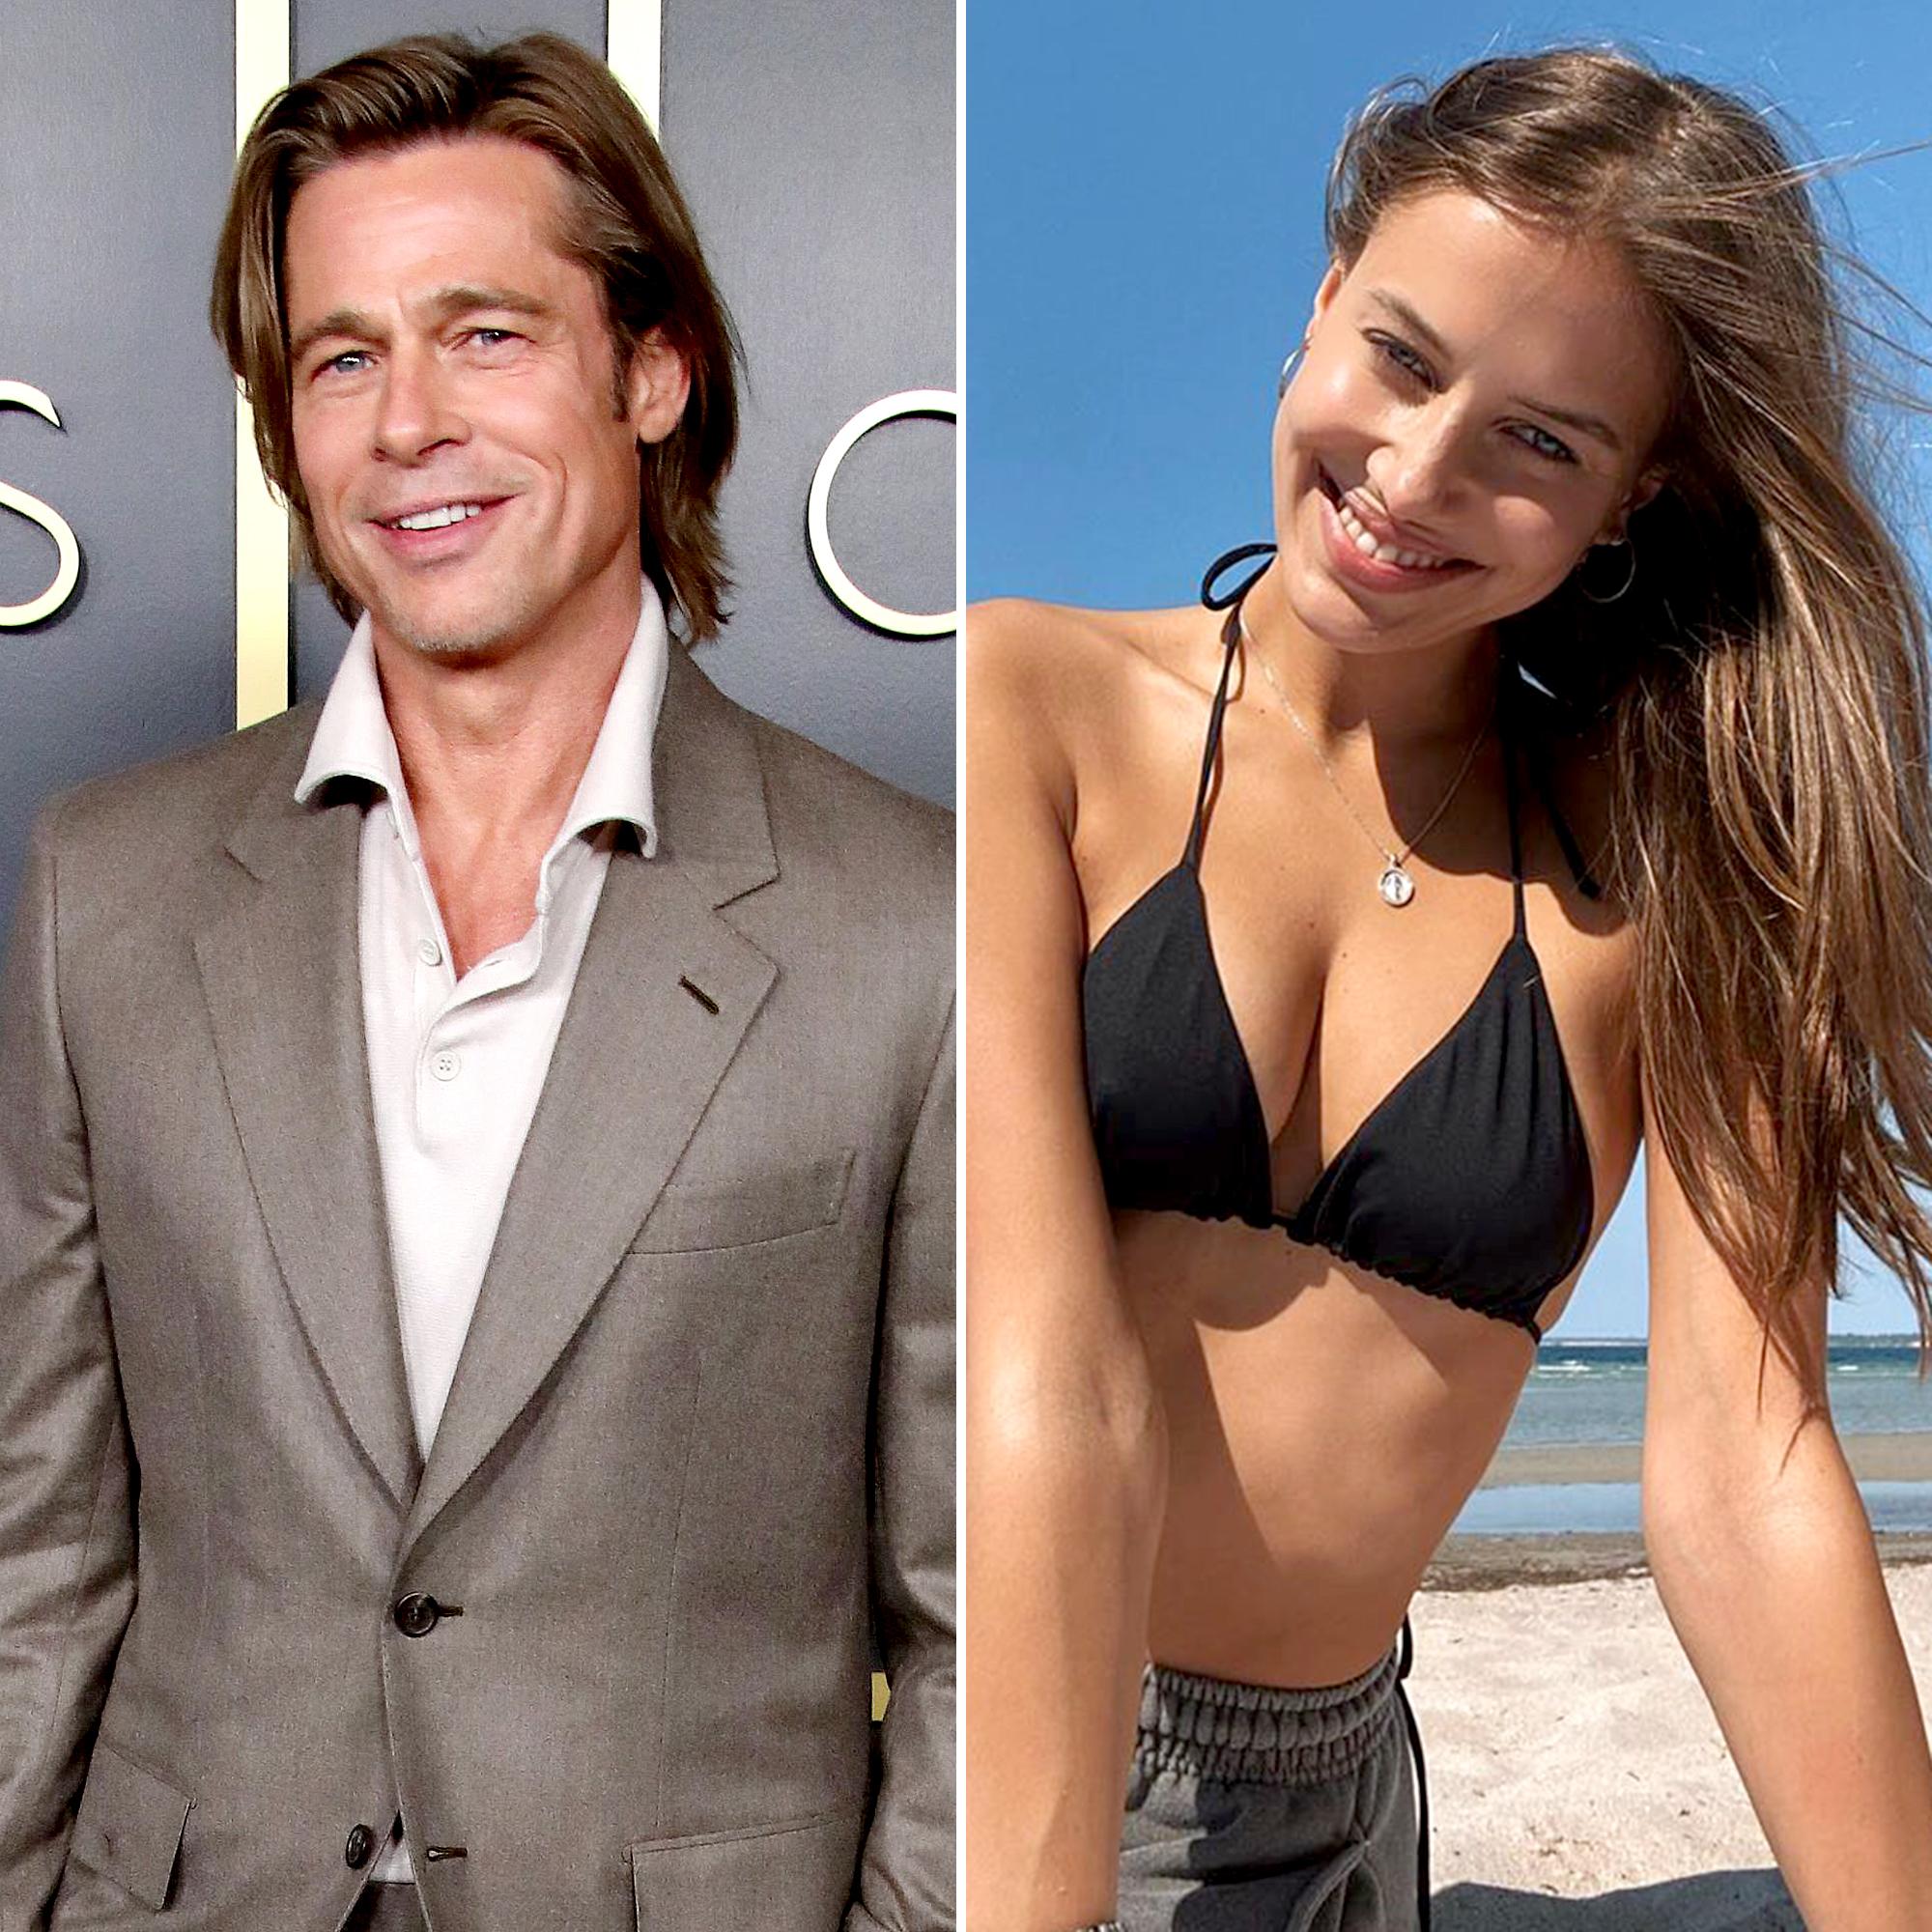 Brad Pitt Nicole Poturalski Looked Flirty Months Before Dating News